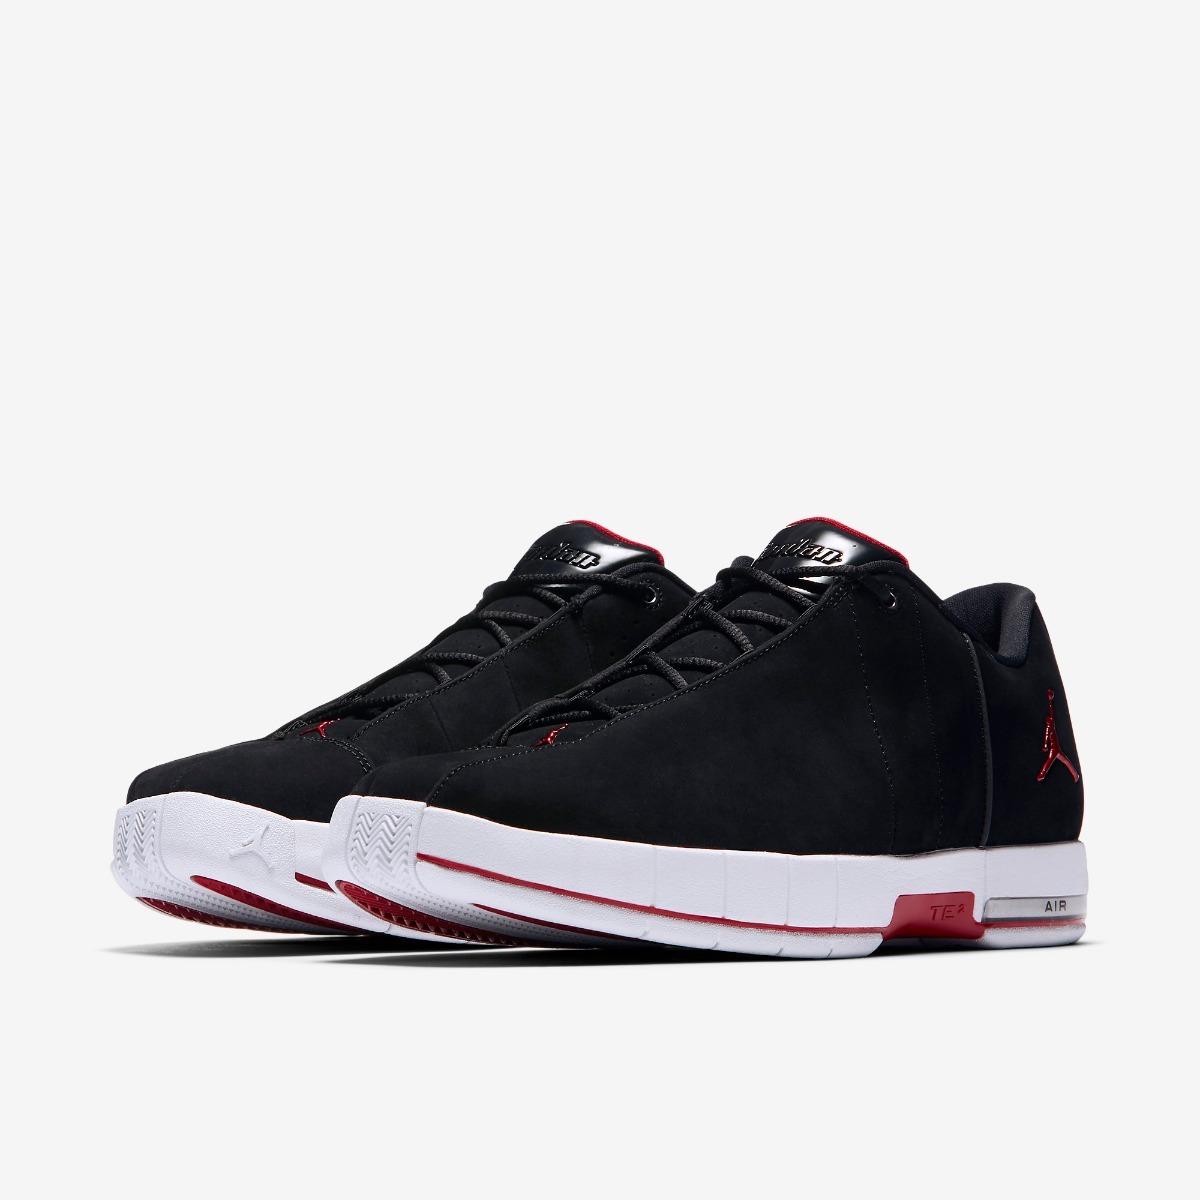 the best attitude f1ceb df254 Zapatillas Nike Air Jordan Te 2 Low Flight Negro Original